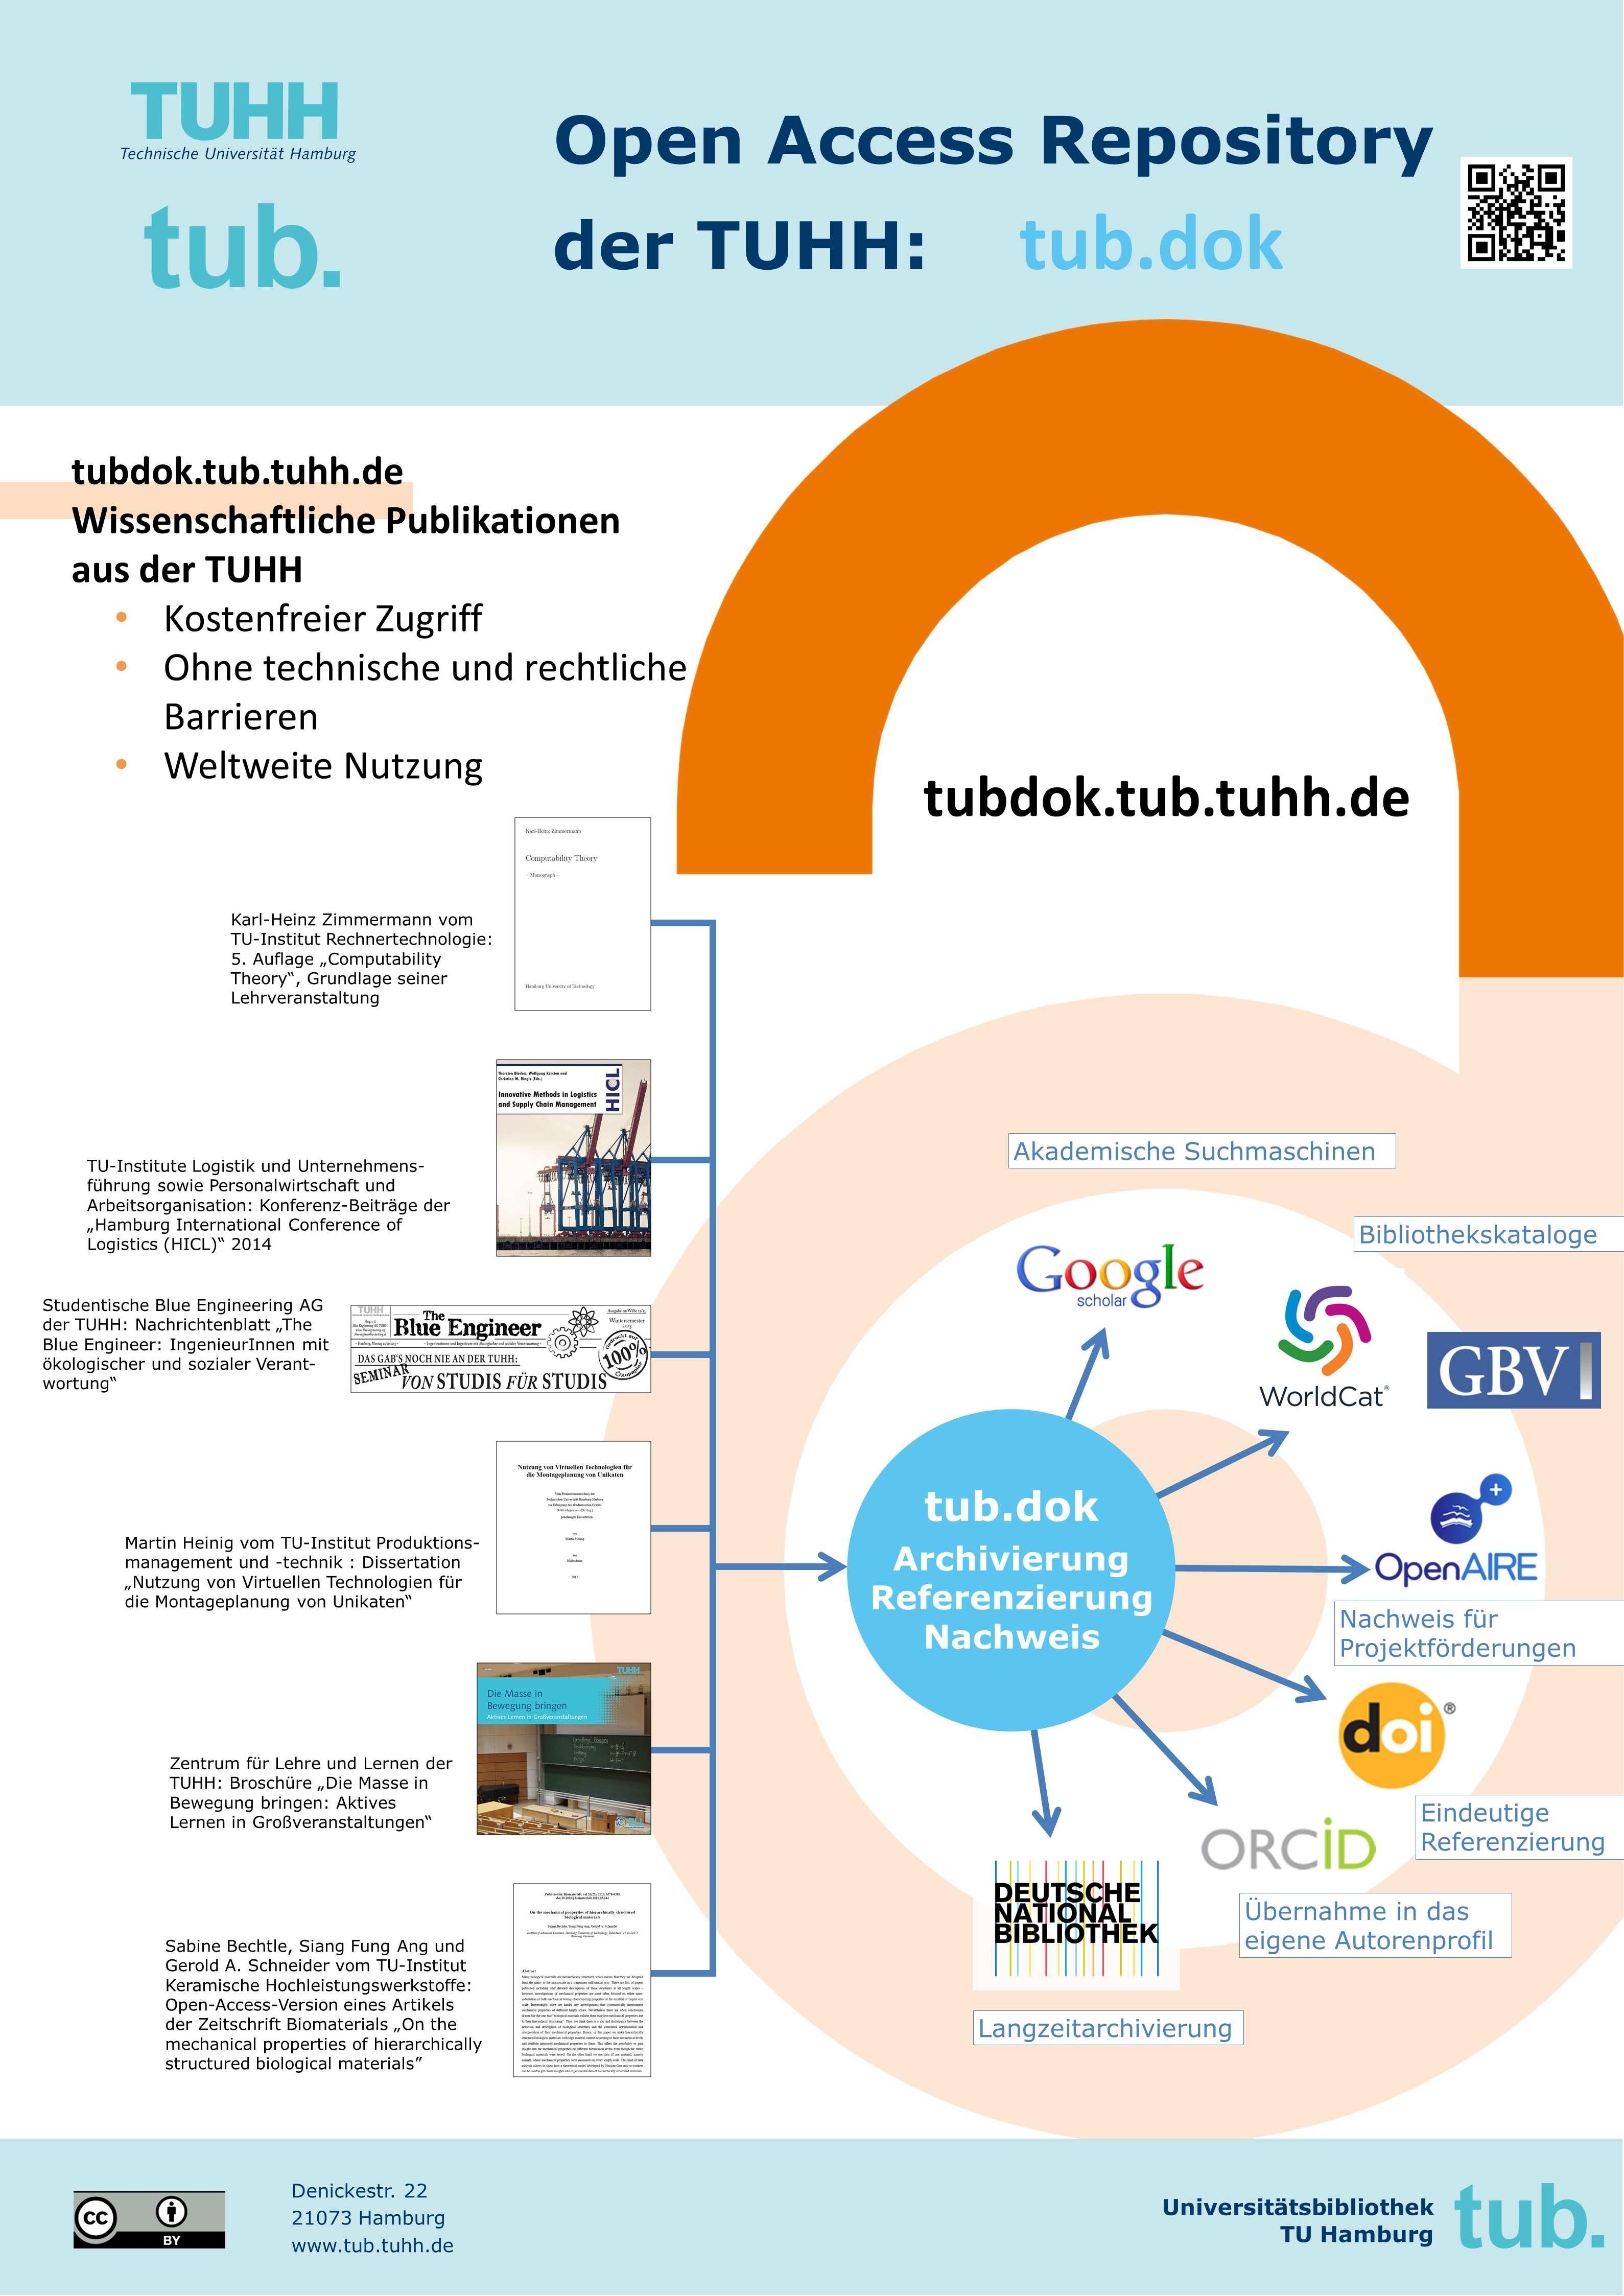 Open Access Repository - Plakat der tub. 2018